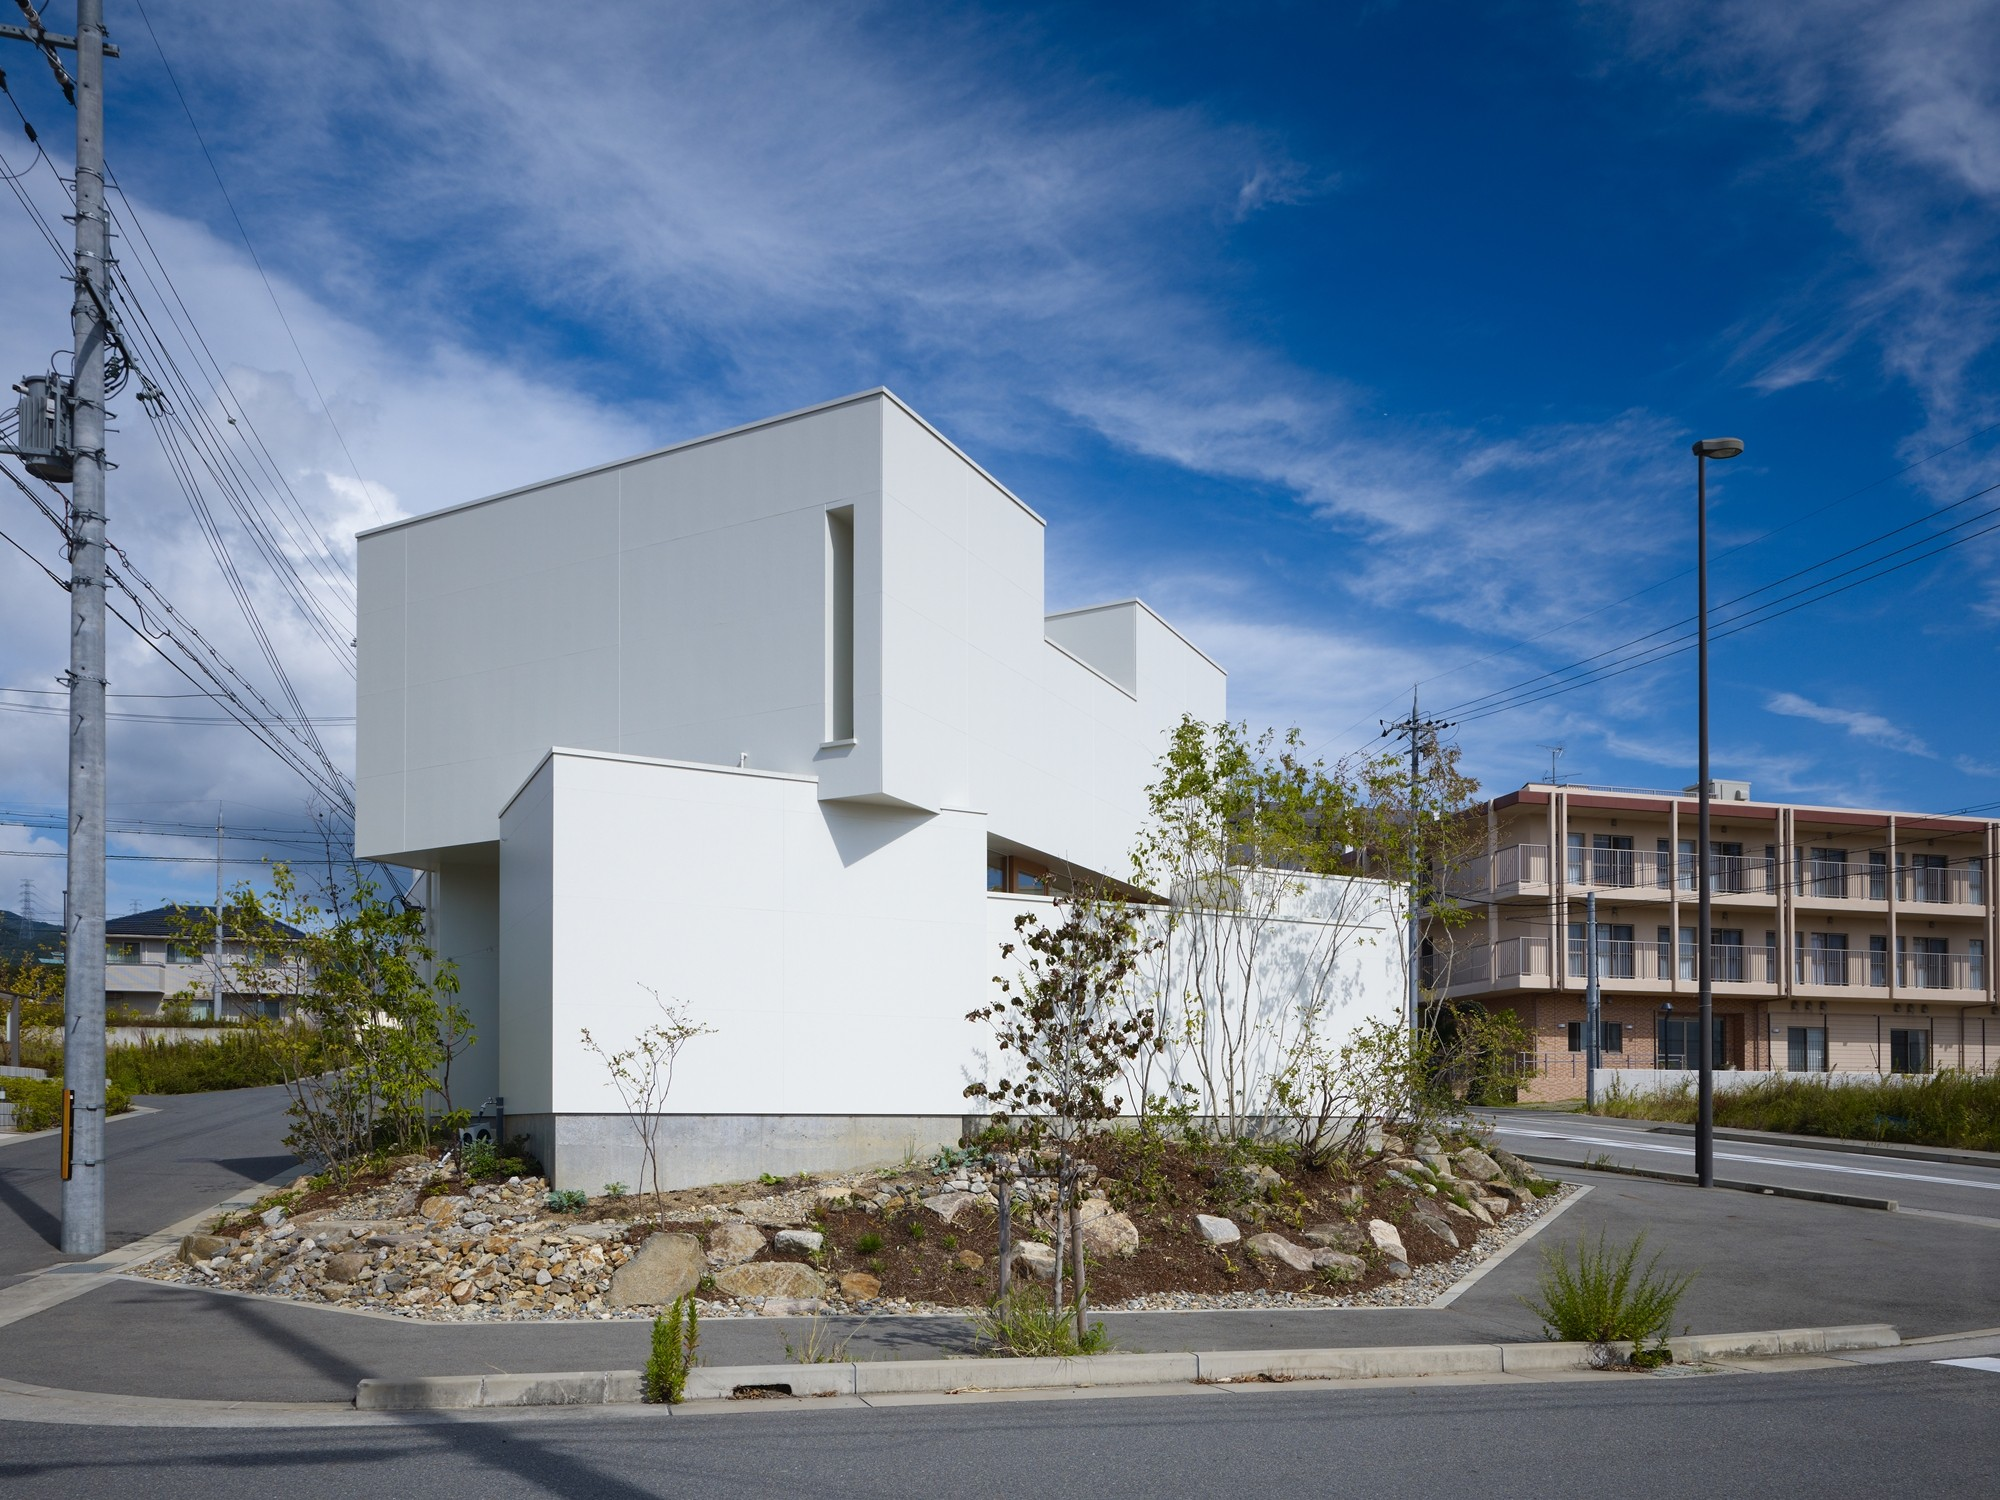 House in Minoh / Fujiwarramuro Architects, © Toshiyuki Yano